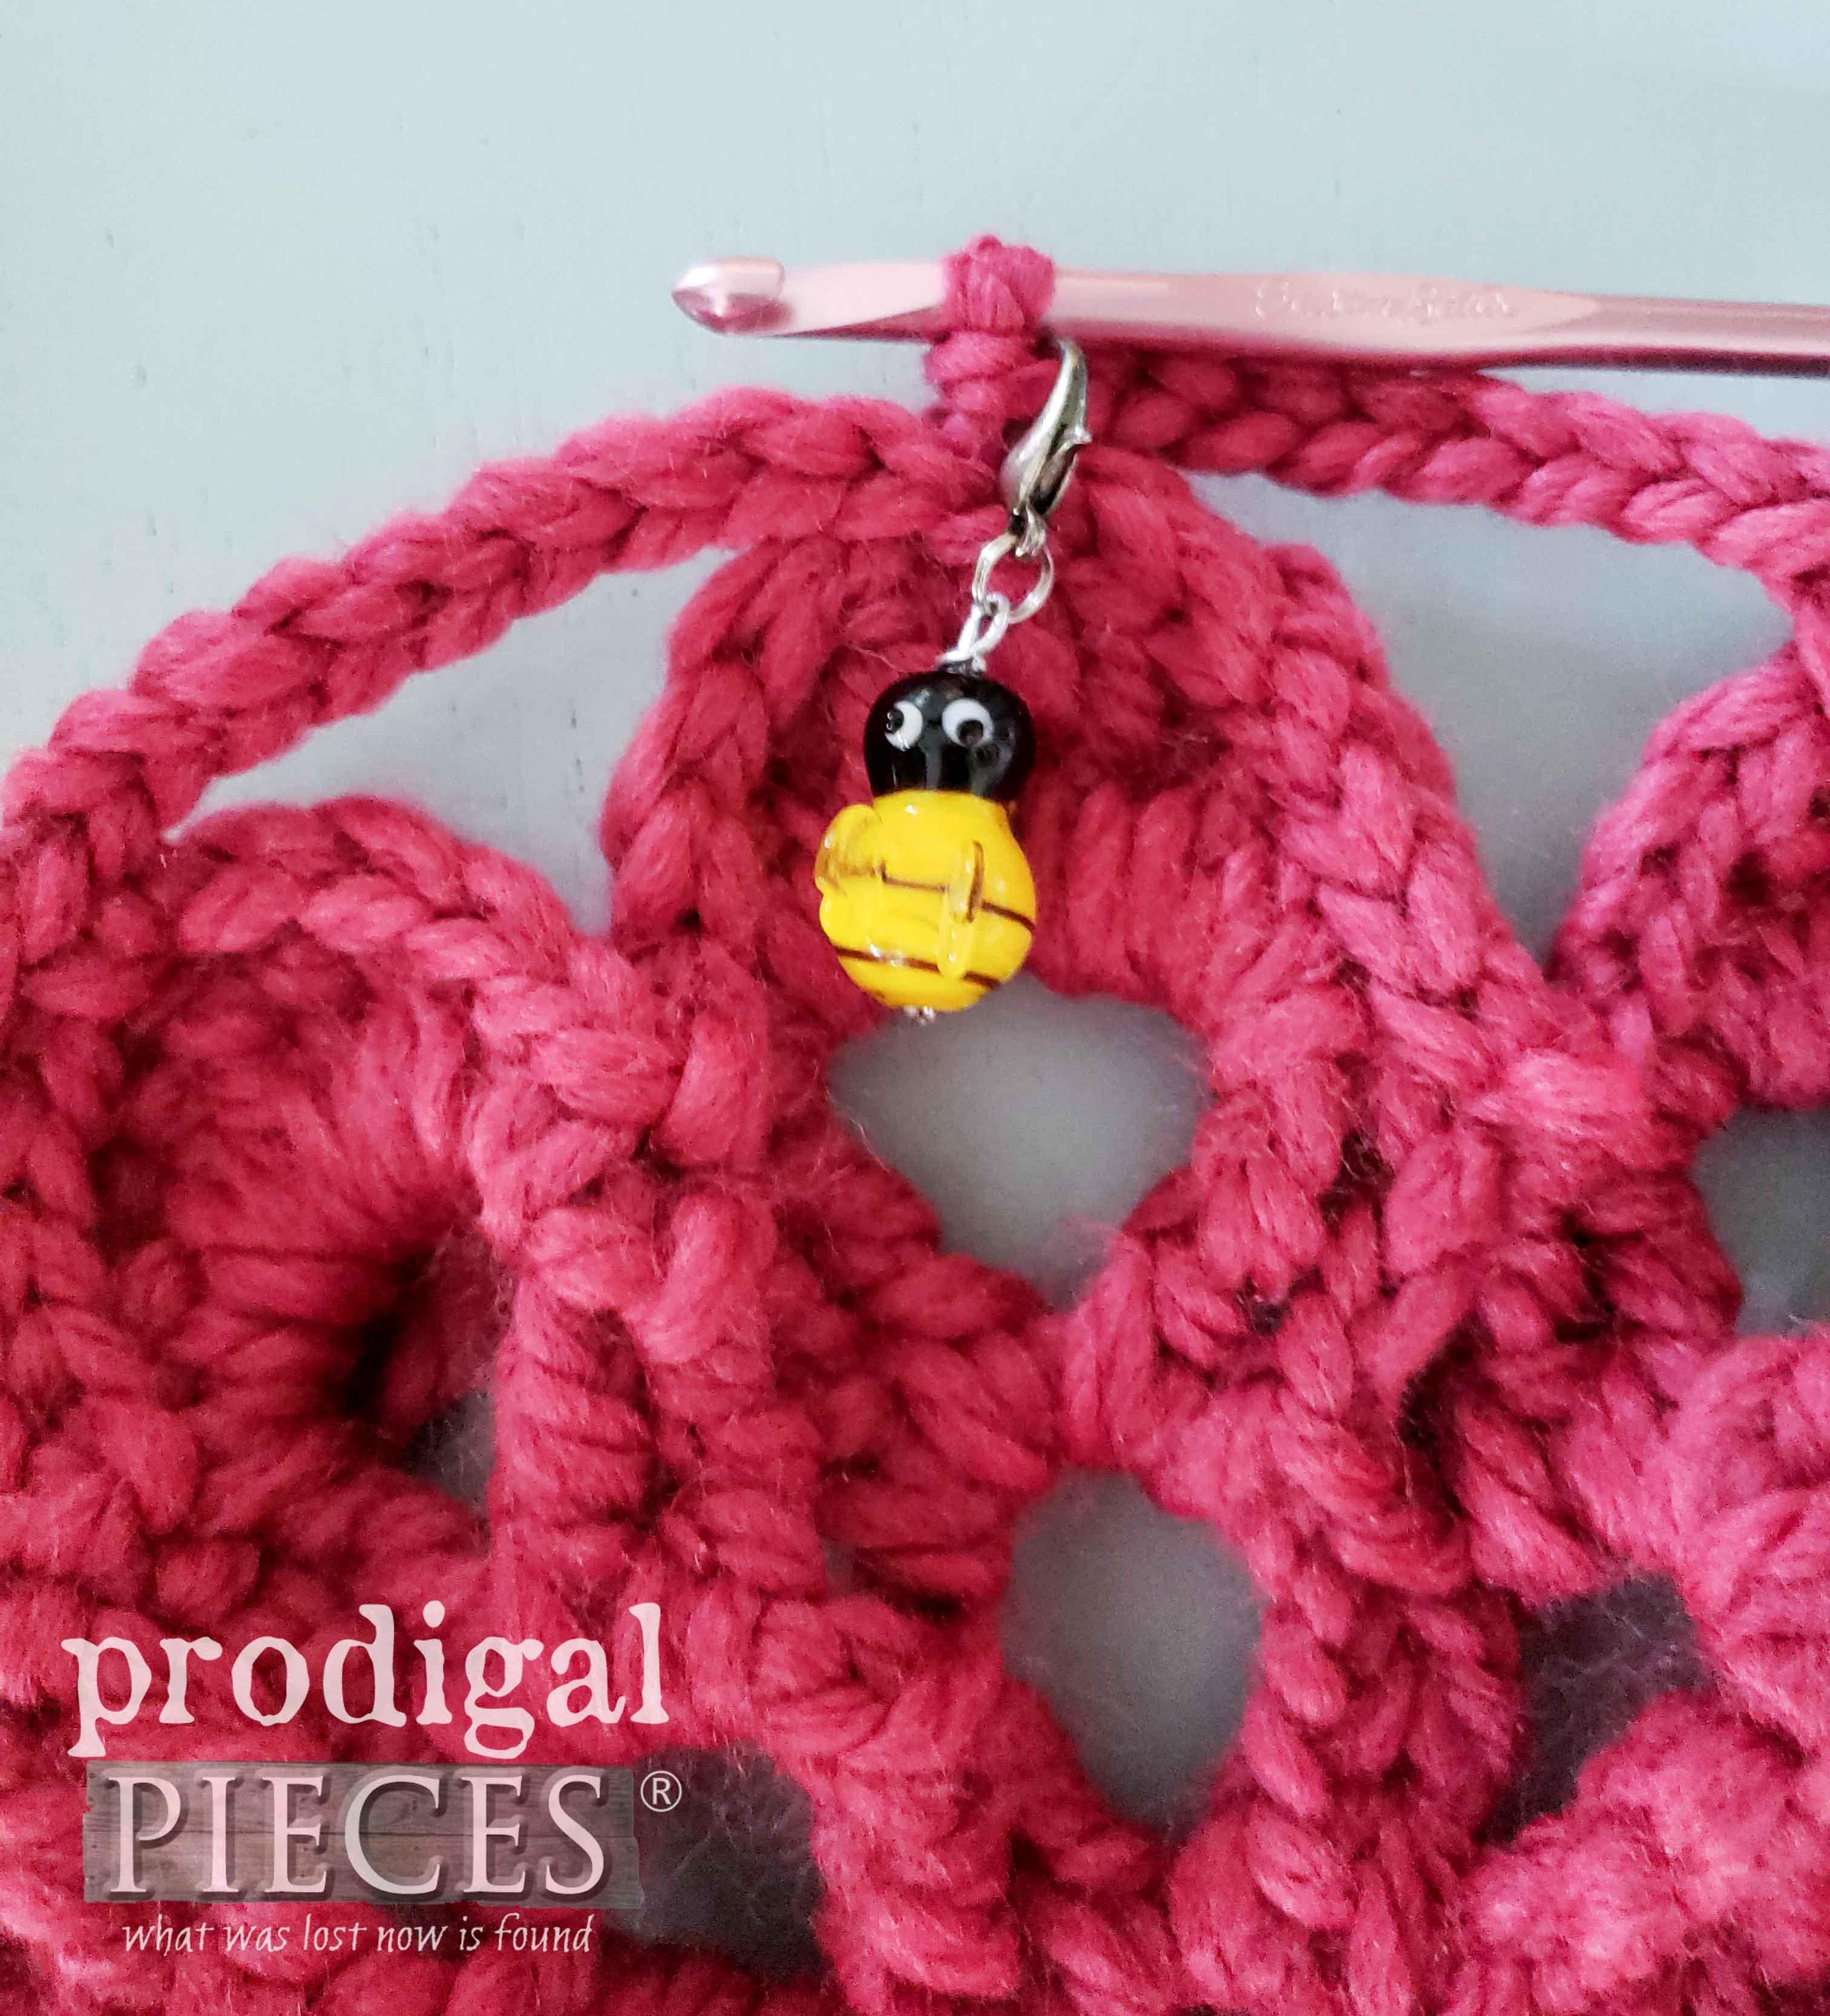 Handmade Crochet Stitch Marker by Larissa of Prodigal Pieces | prodigalpieces.com #prodigalpieces #diy #home #homedecor #crochet